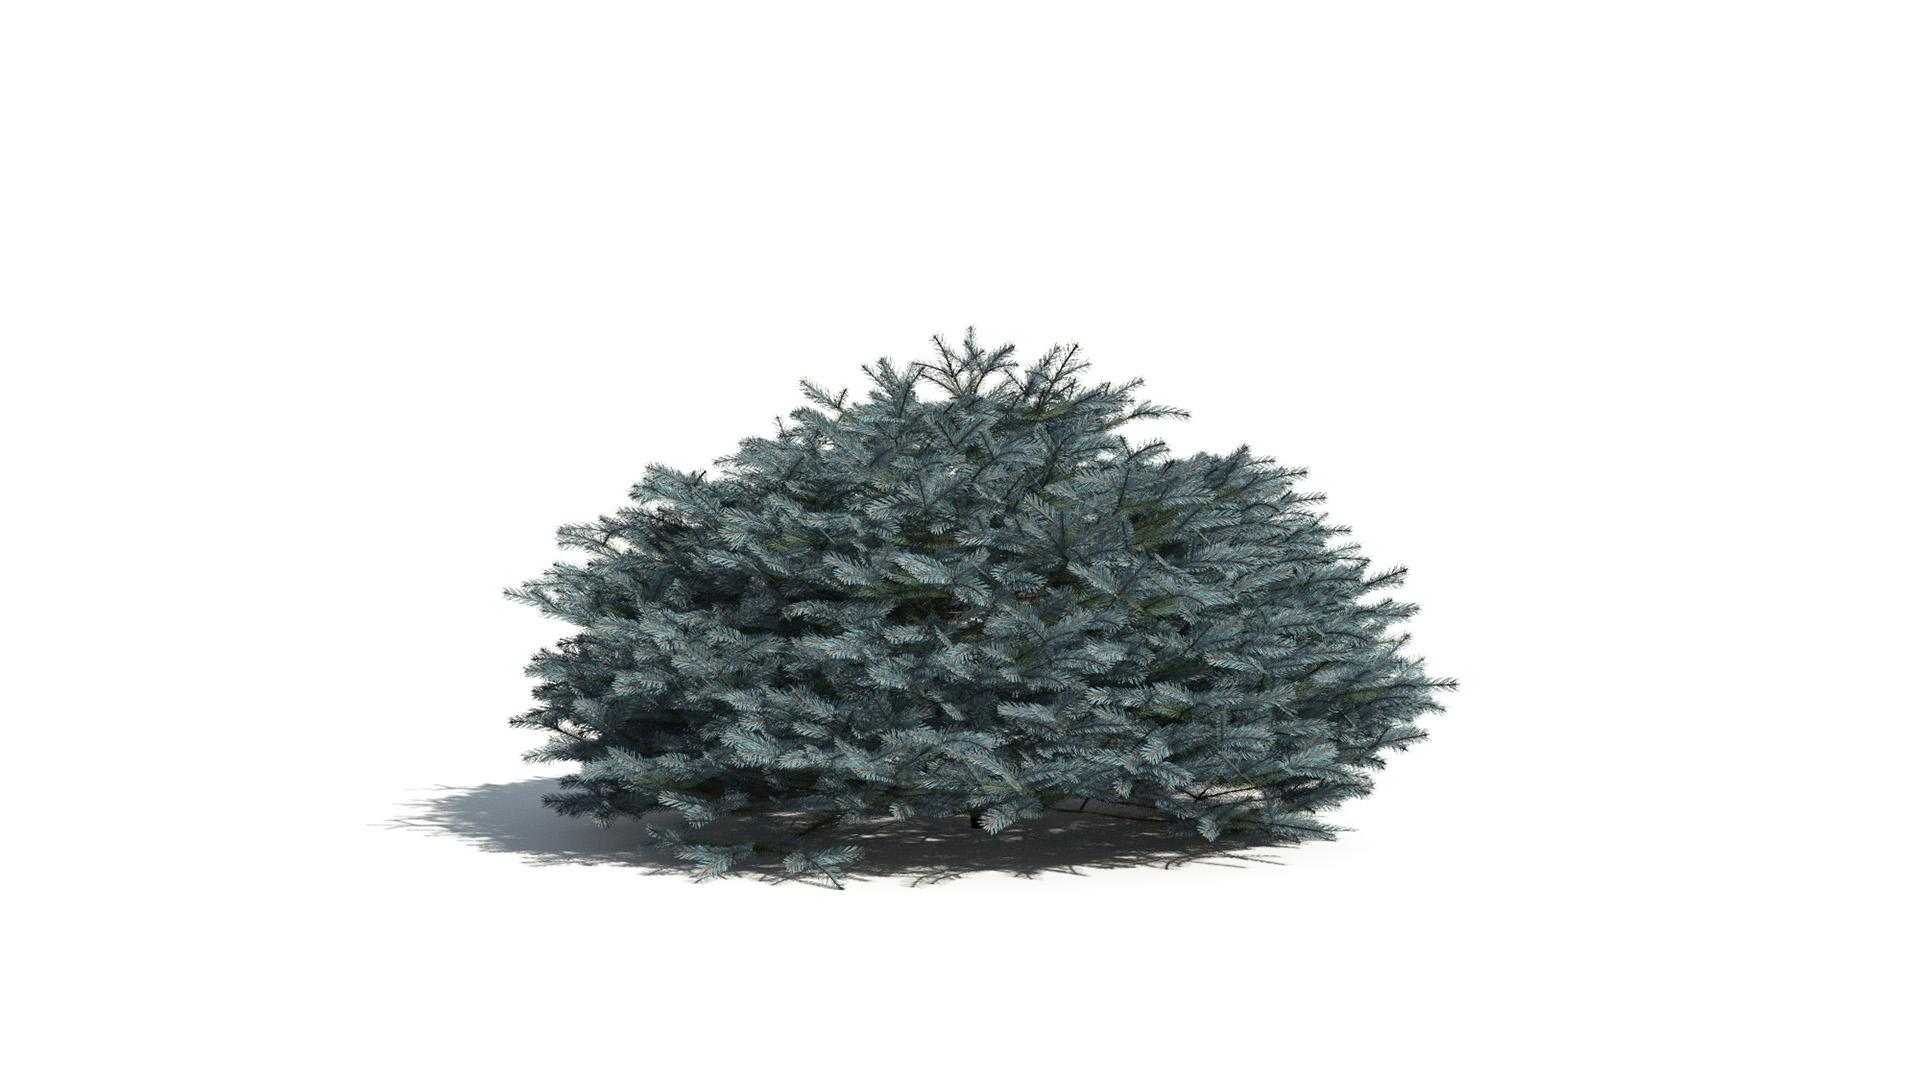 3D model of the Colorado Blue spruce Glauca Globosa Picea pungens